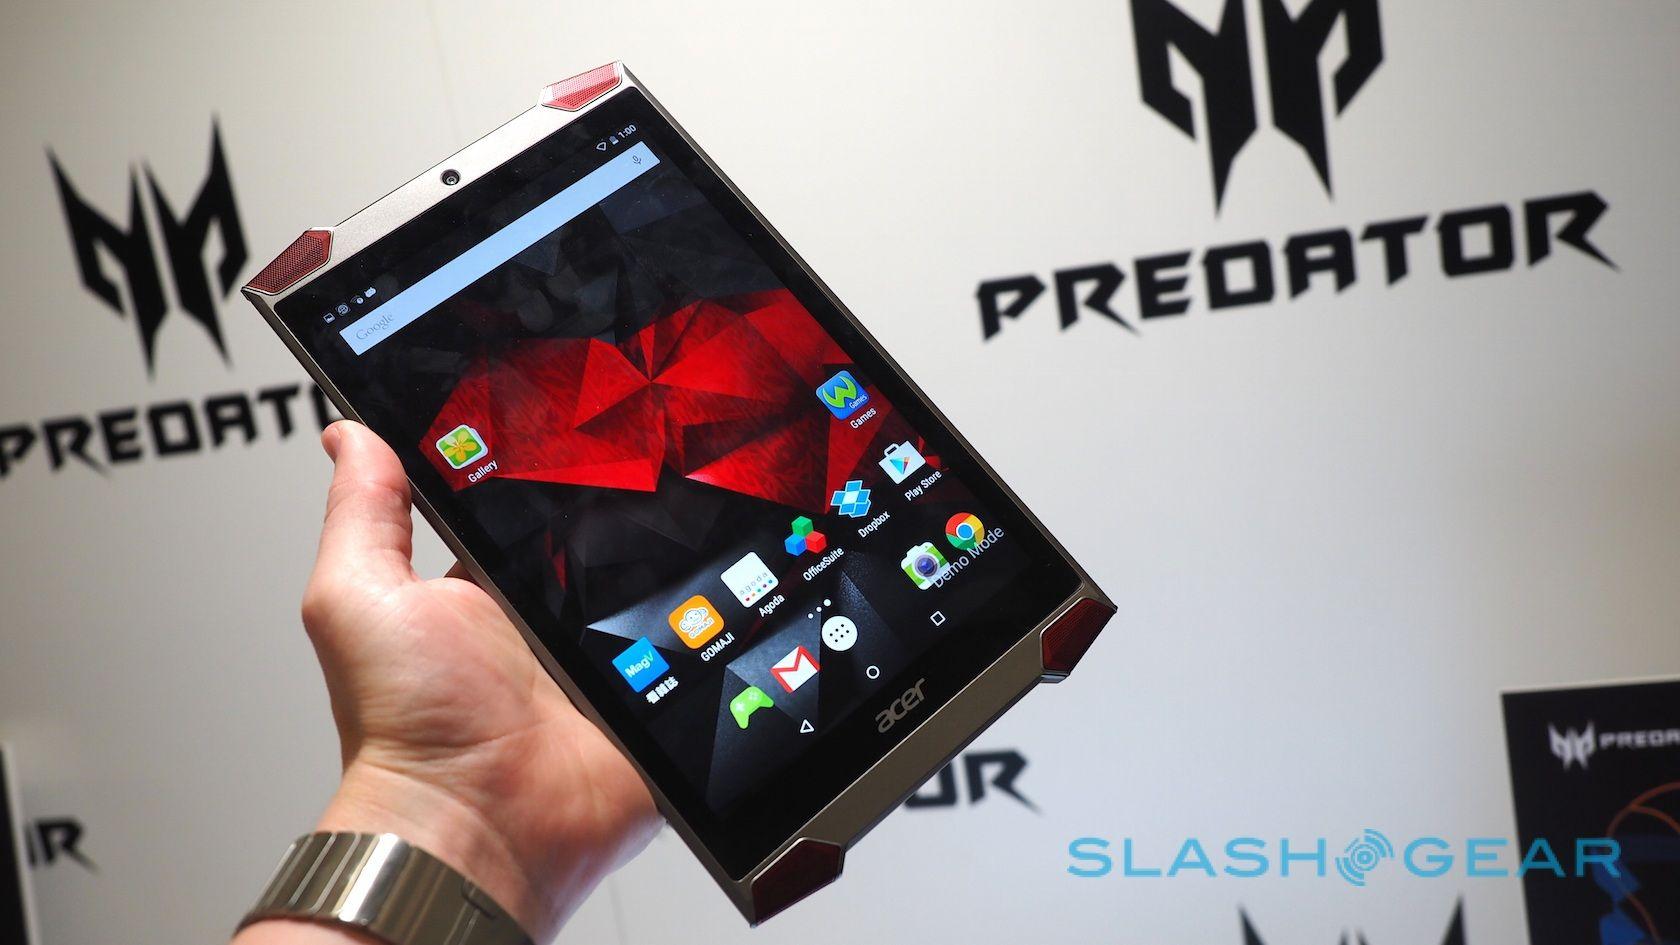 Acer targets tablet gamers with Predator 8: Hands-on - SLASH GEAR #Acer, #Predator8, #Tech